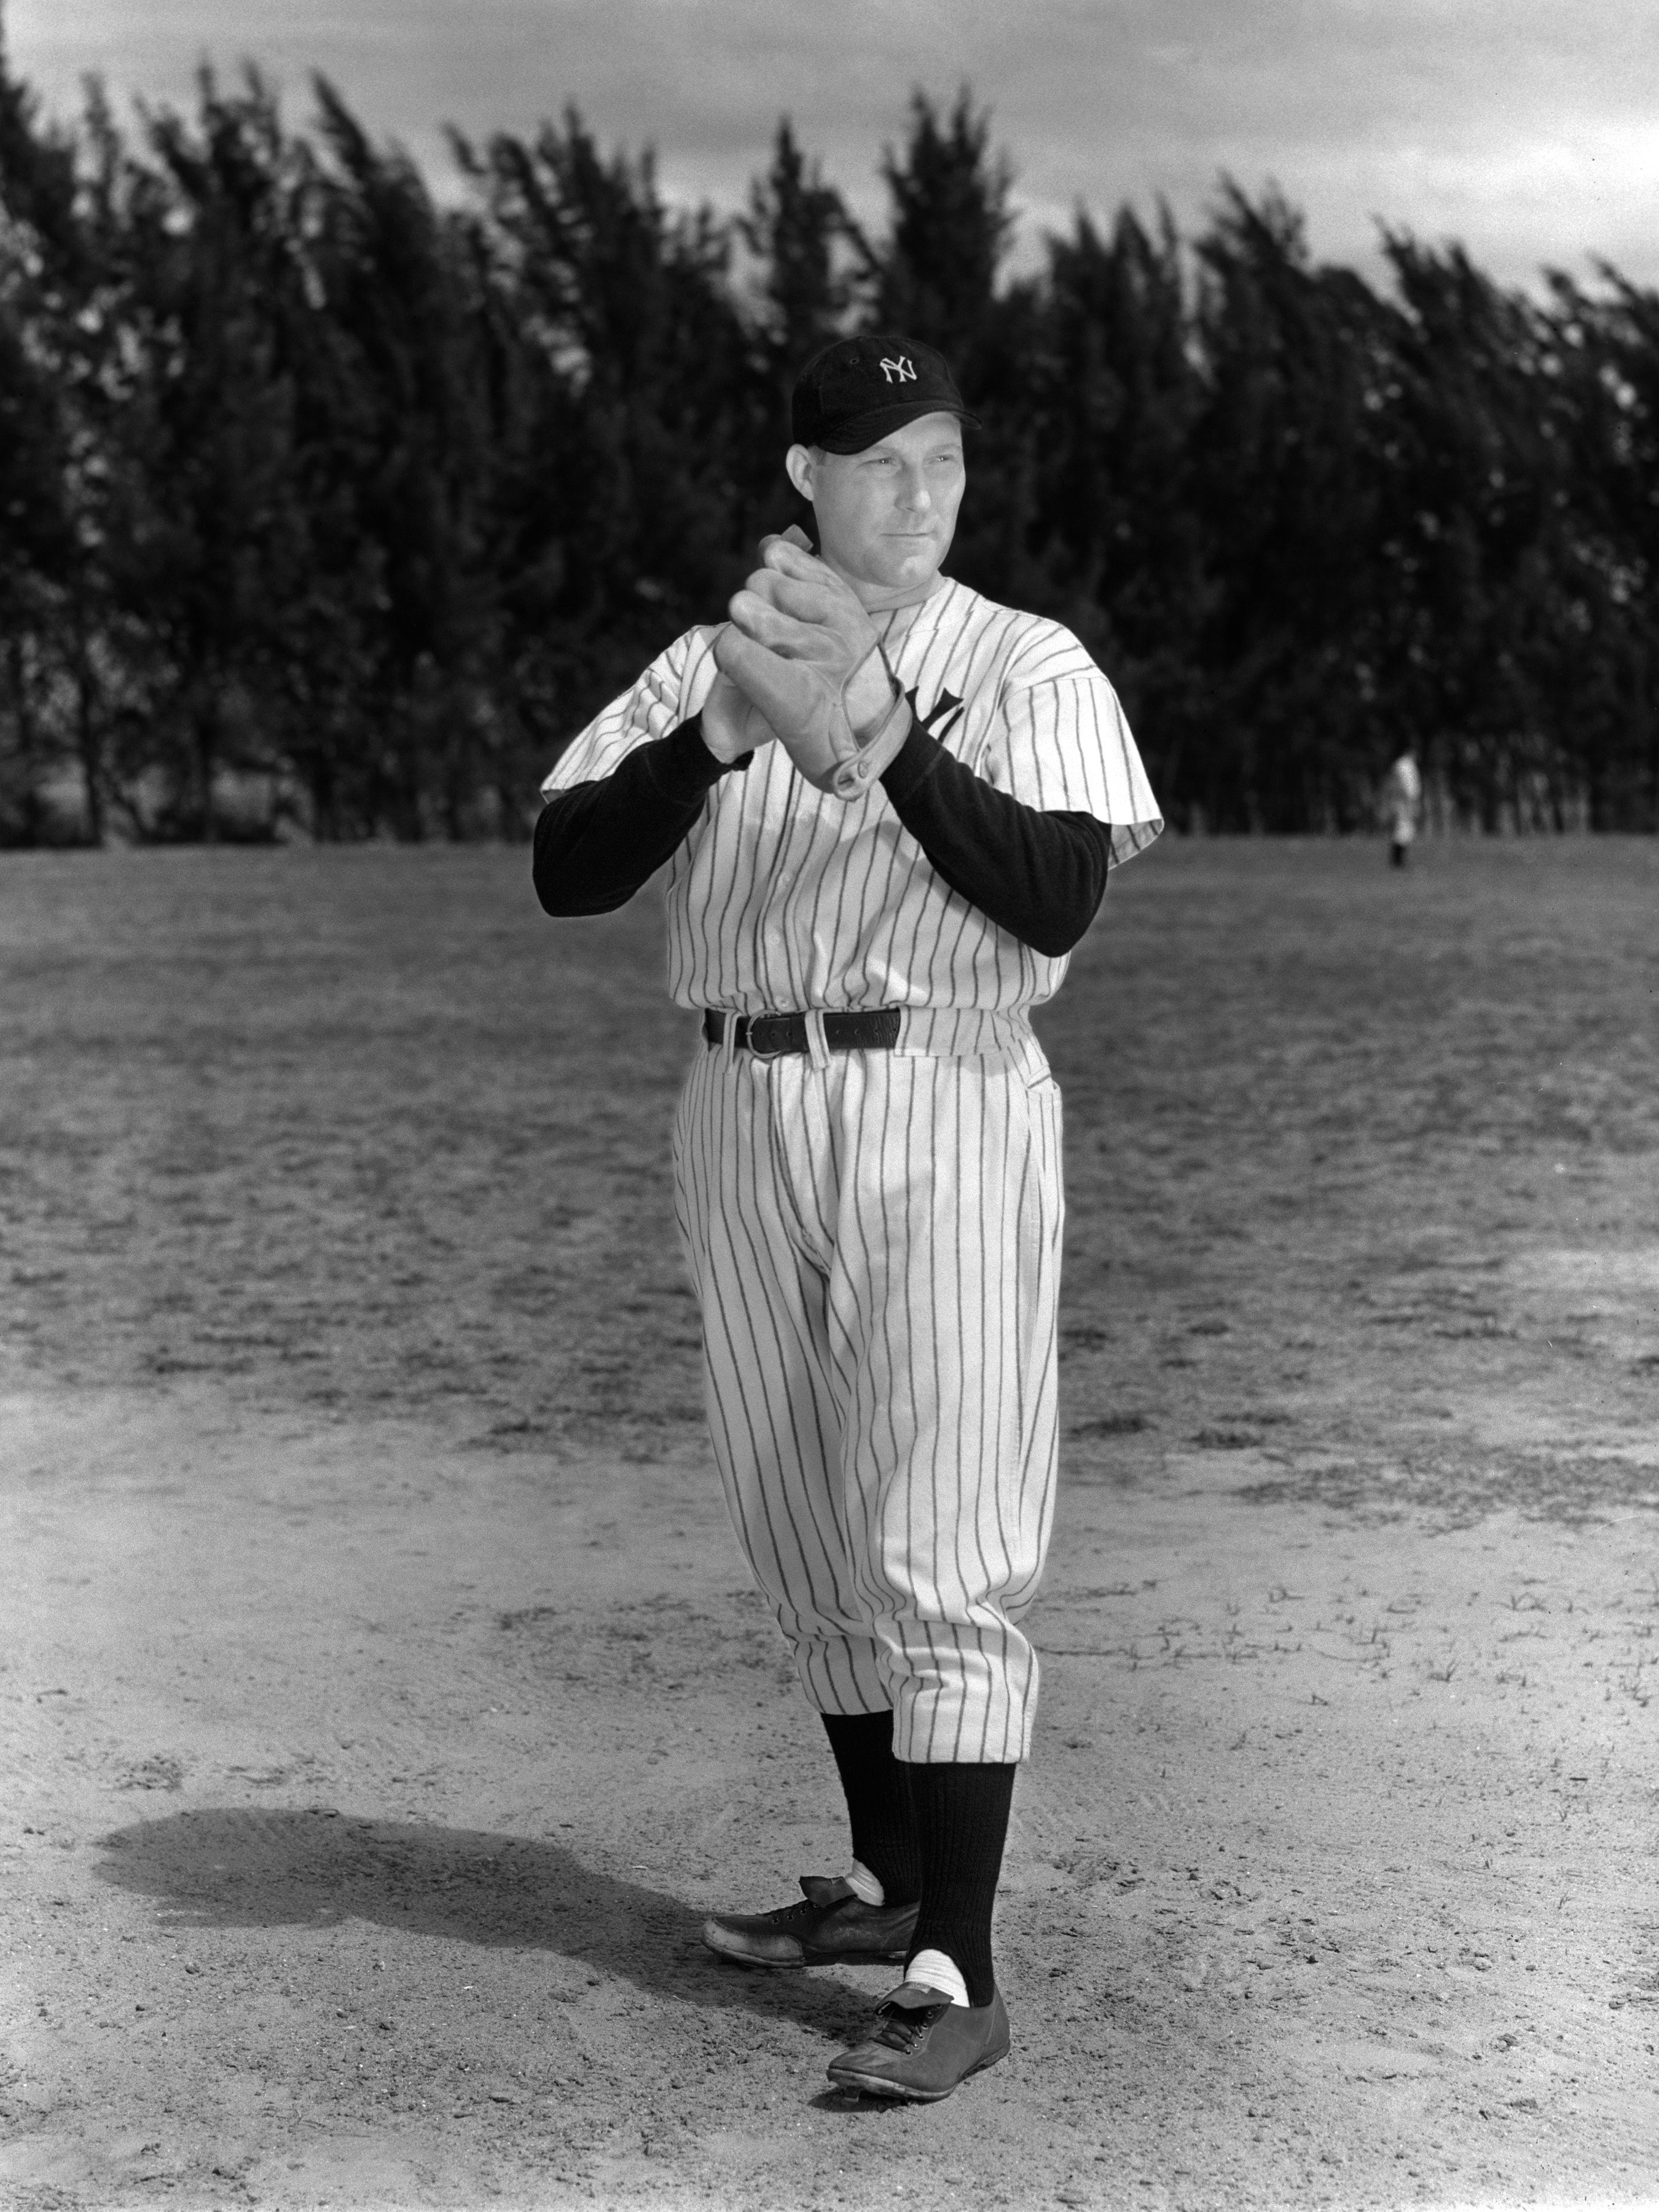 Spring Training - New York Yankees